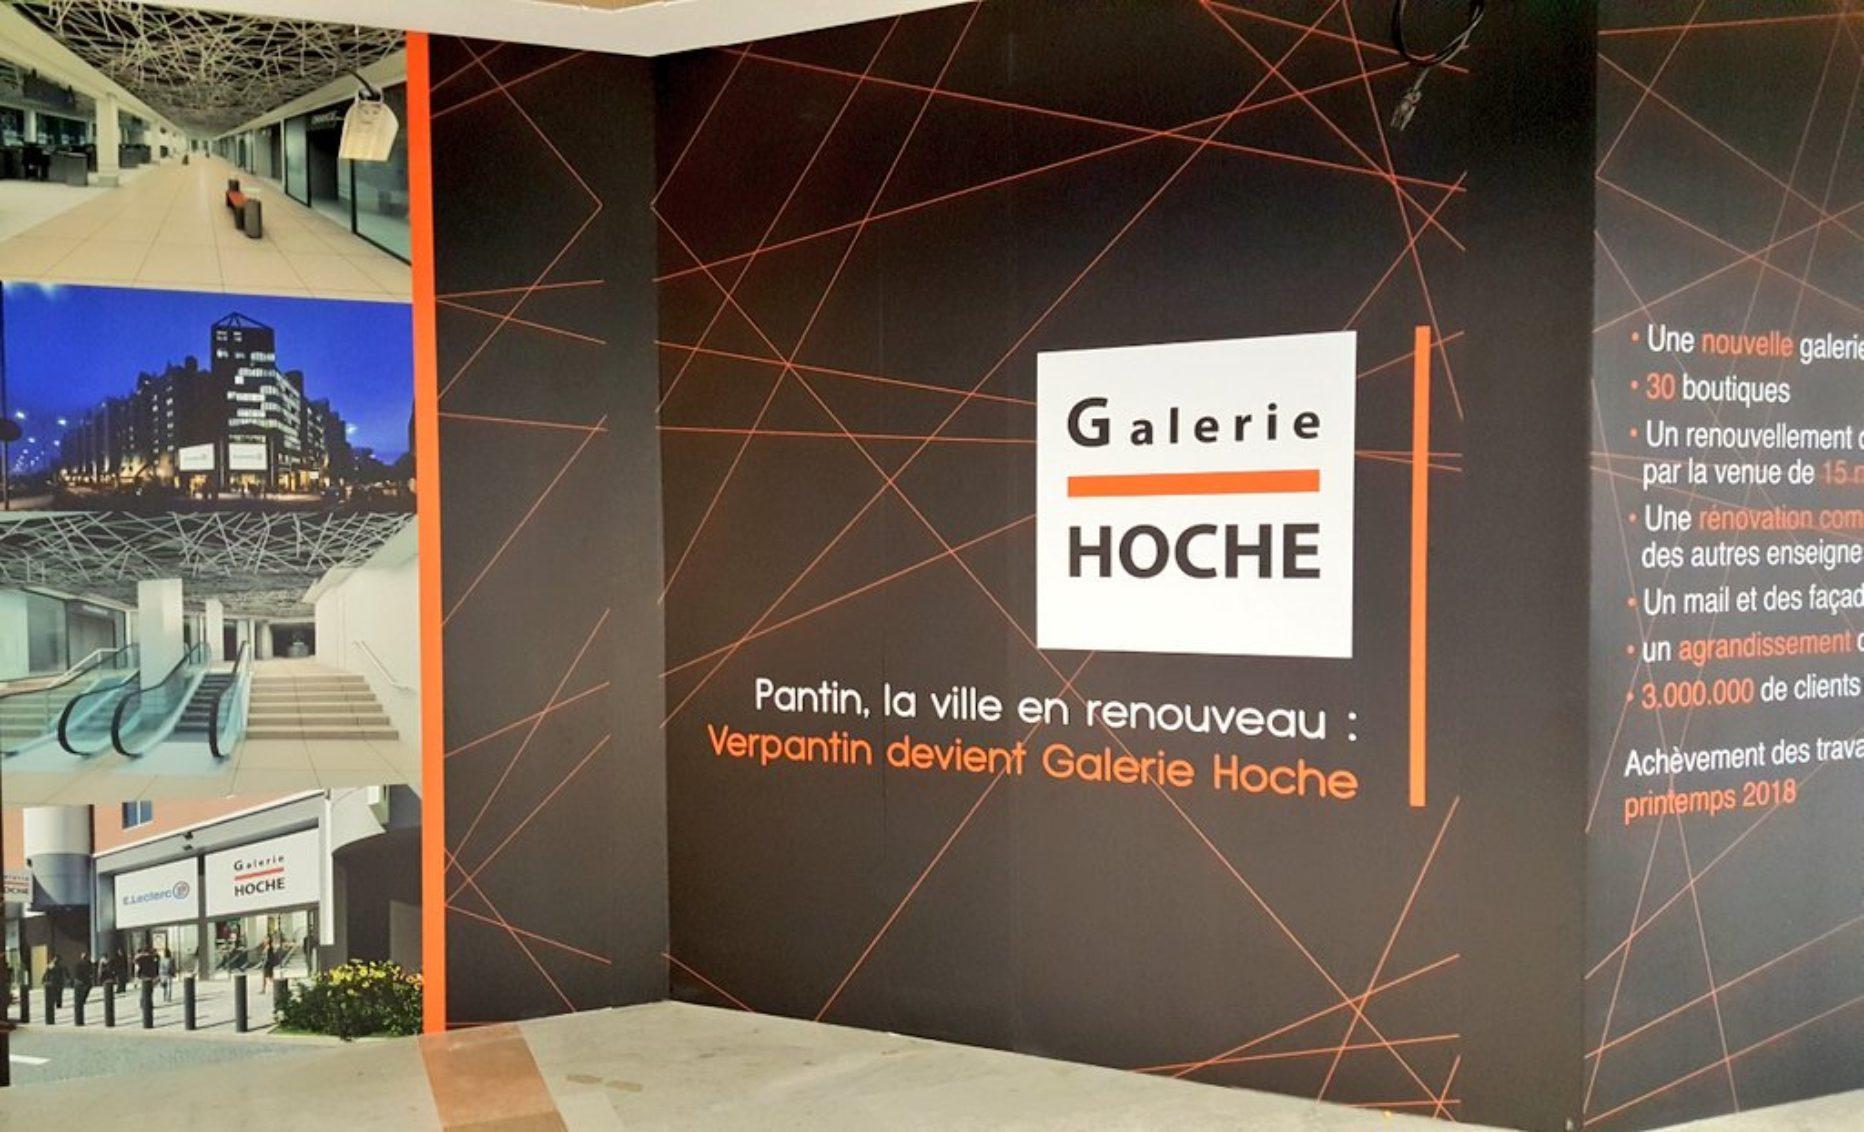 Centre Commercial Verpantin / Galerie Hoche